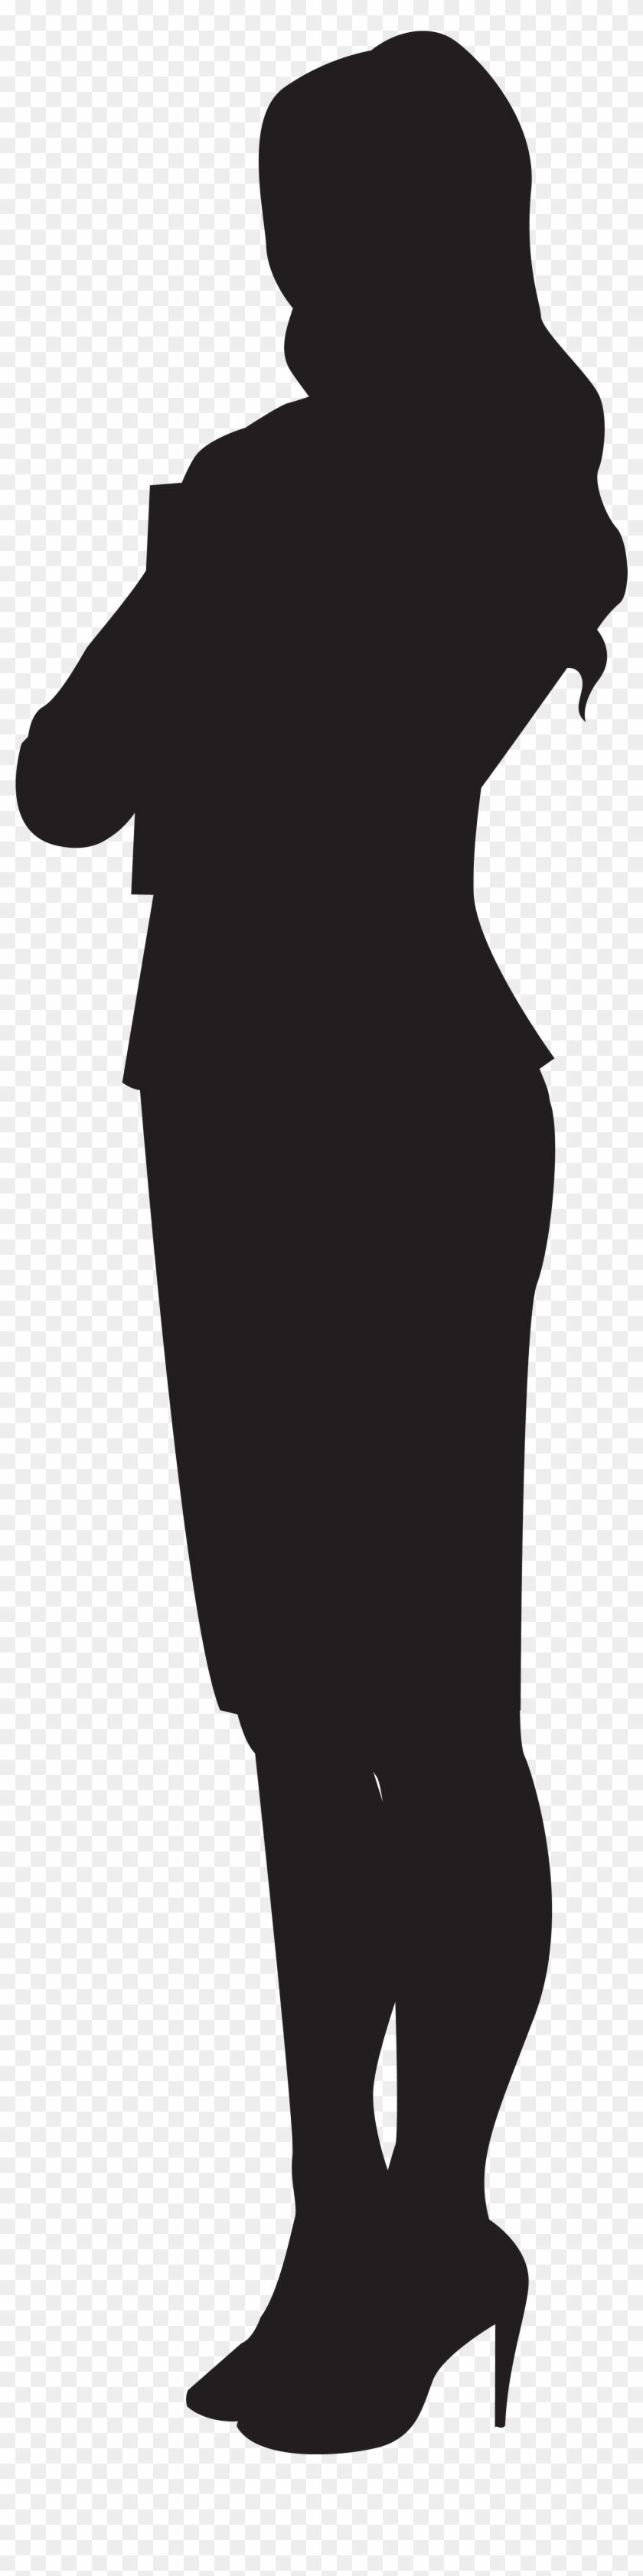 Woman Silhouette Png Clip Art - Woman Clip Art Png #5753